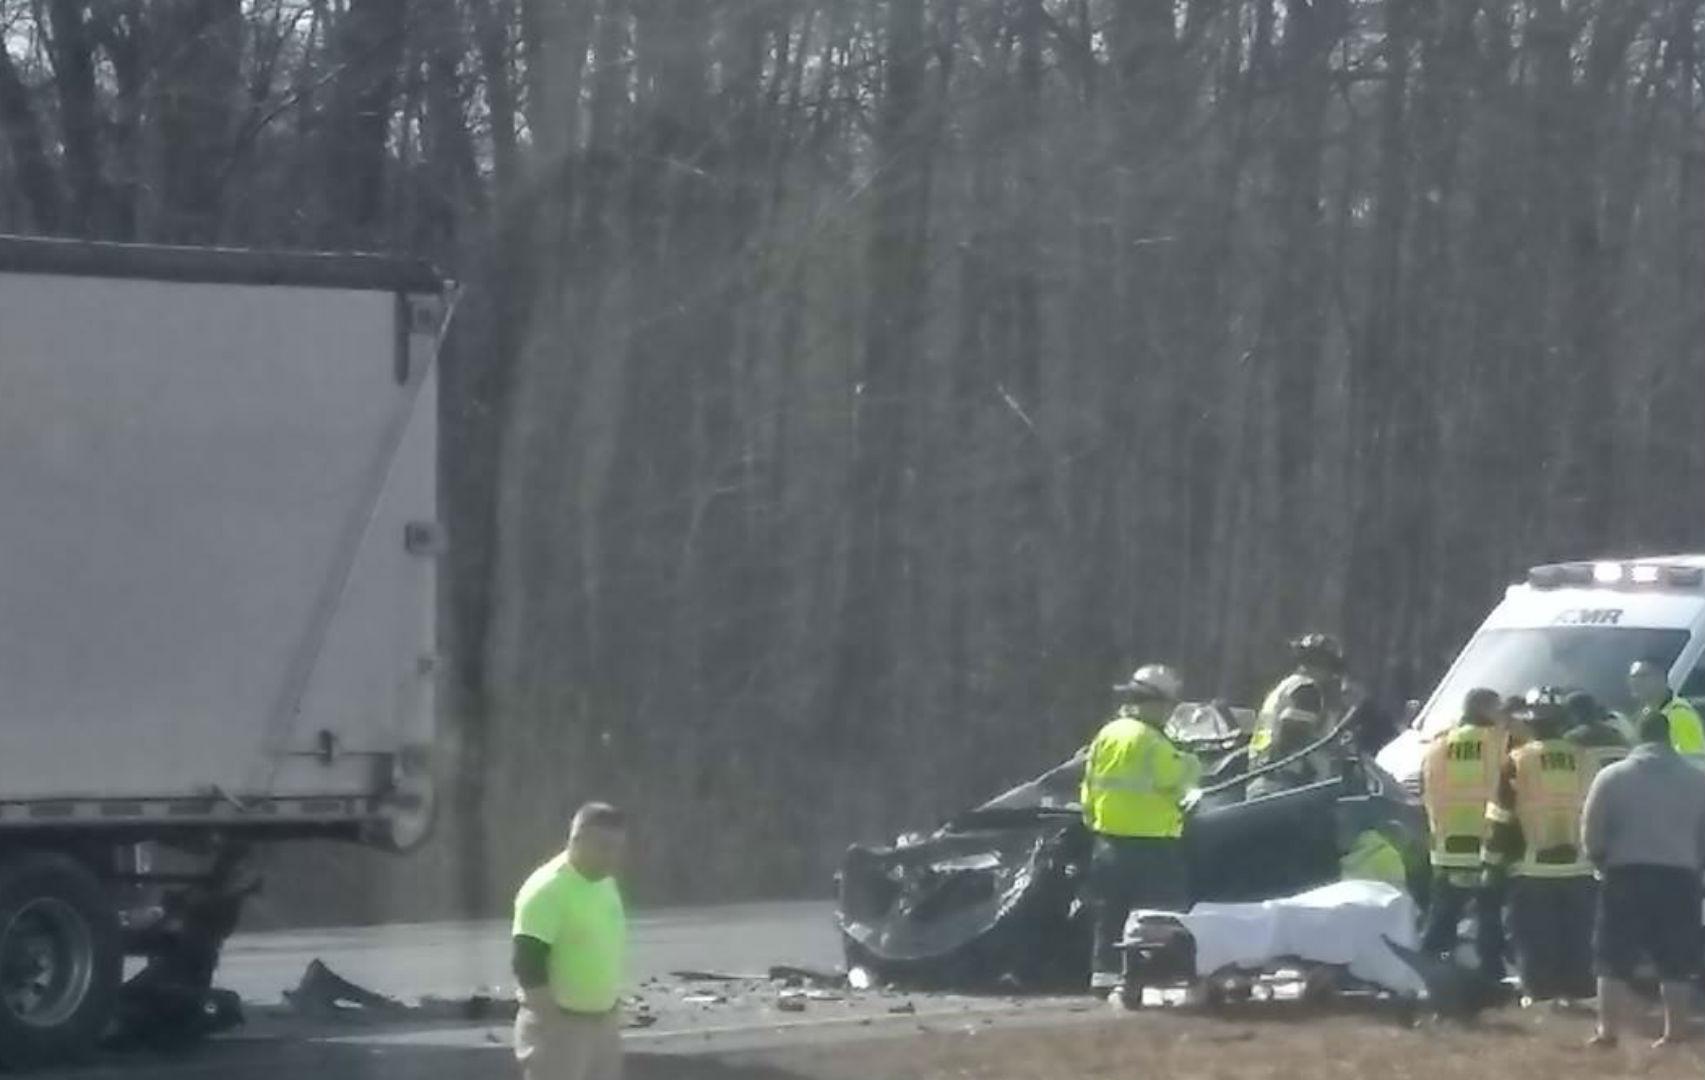 Officials identify victim of fatal crash on I-84 East in Farmington